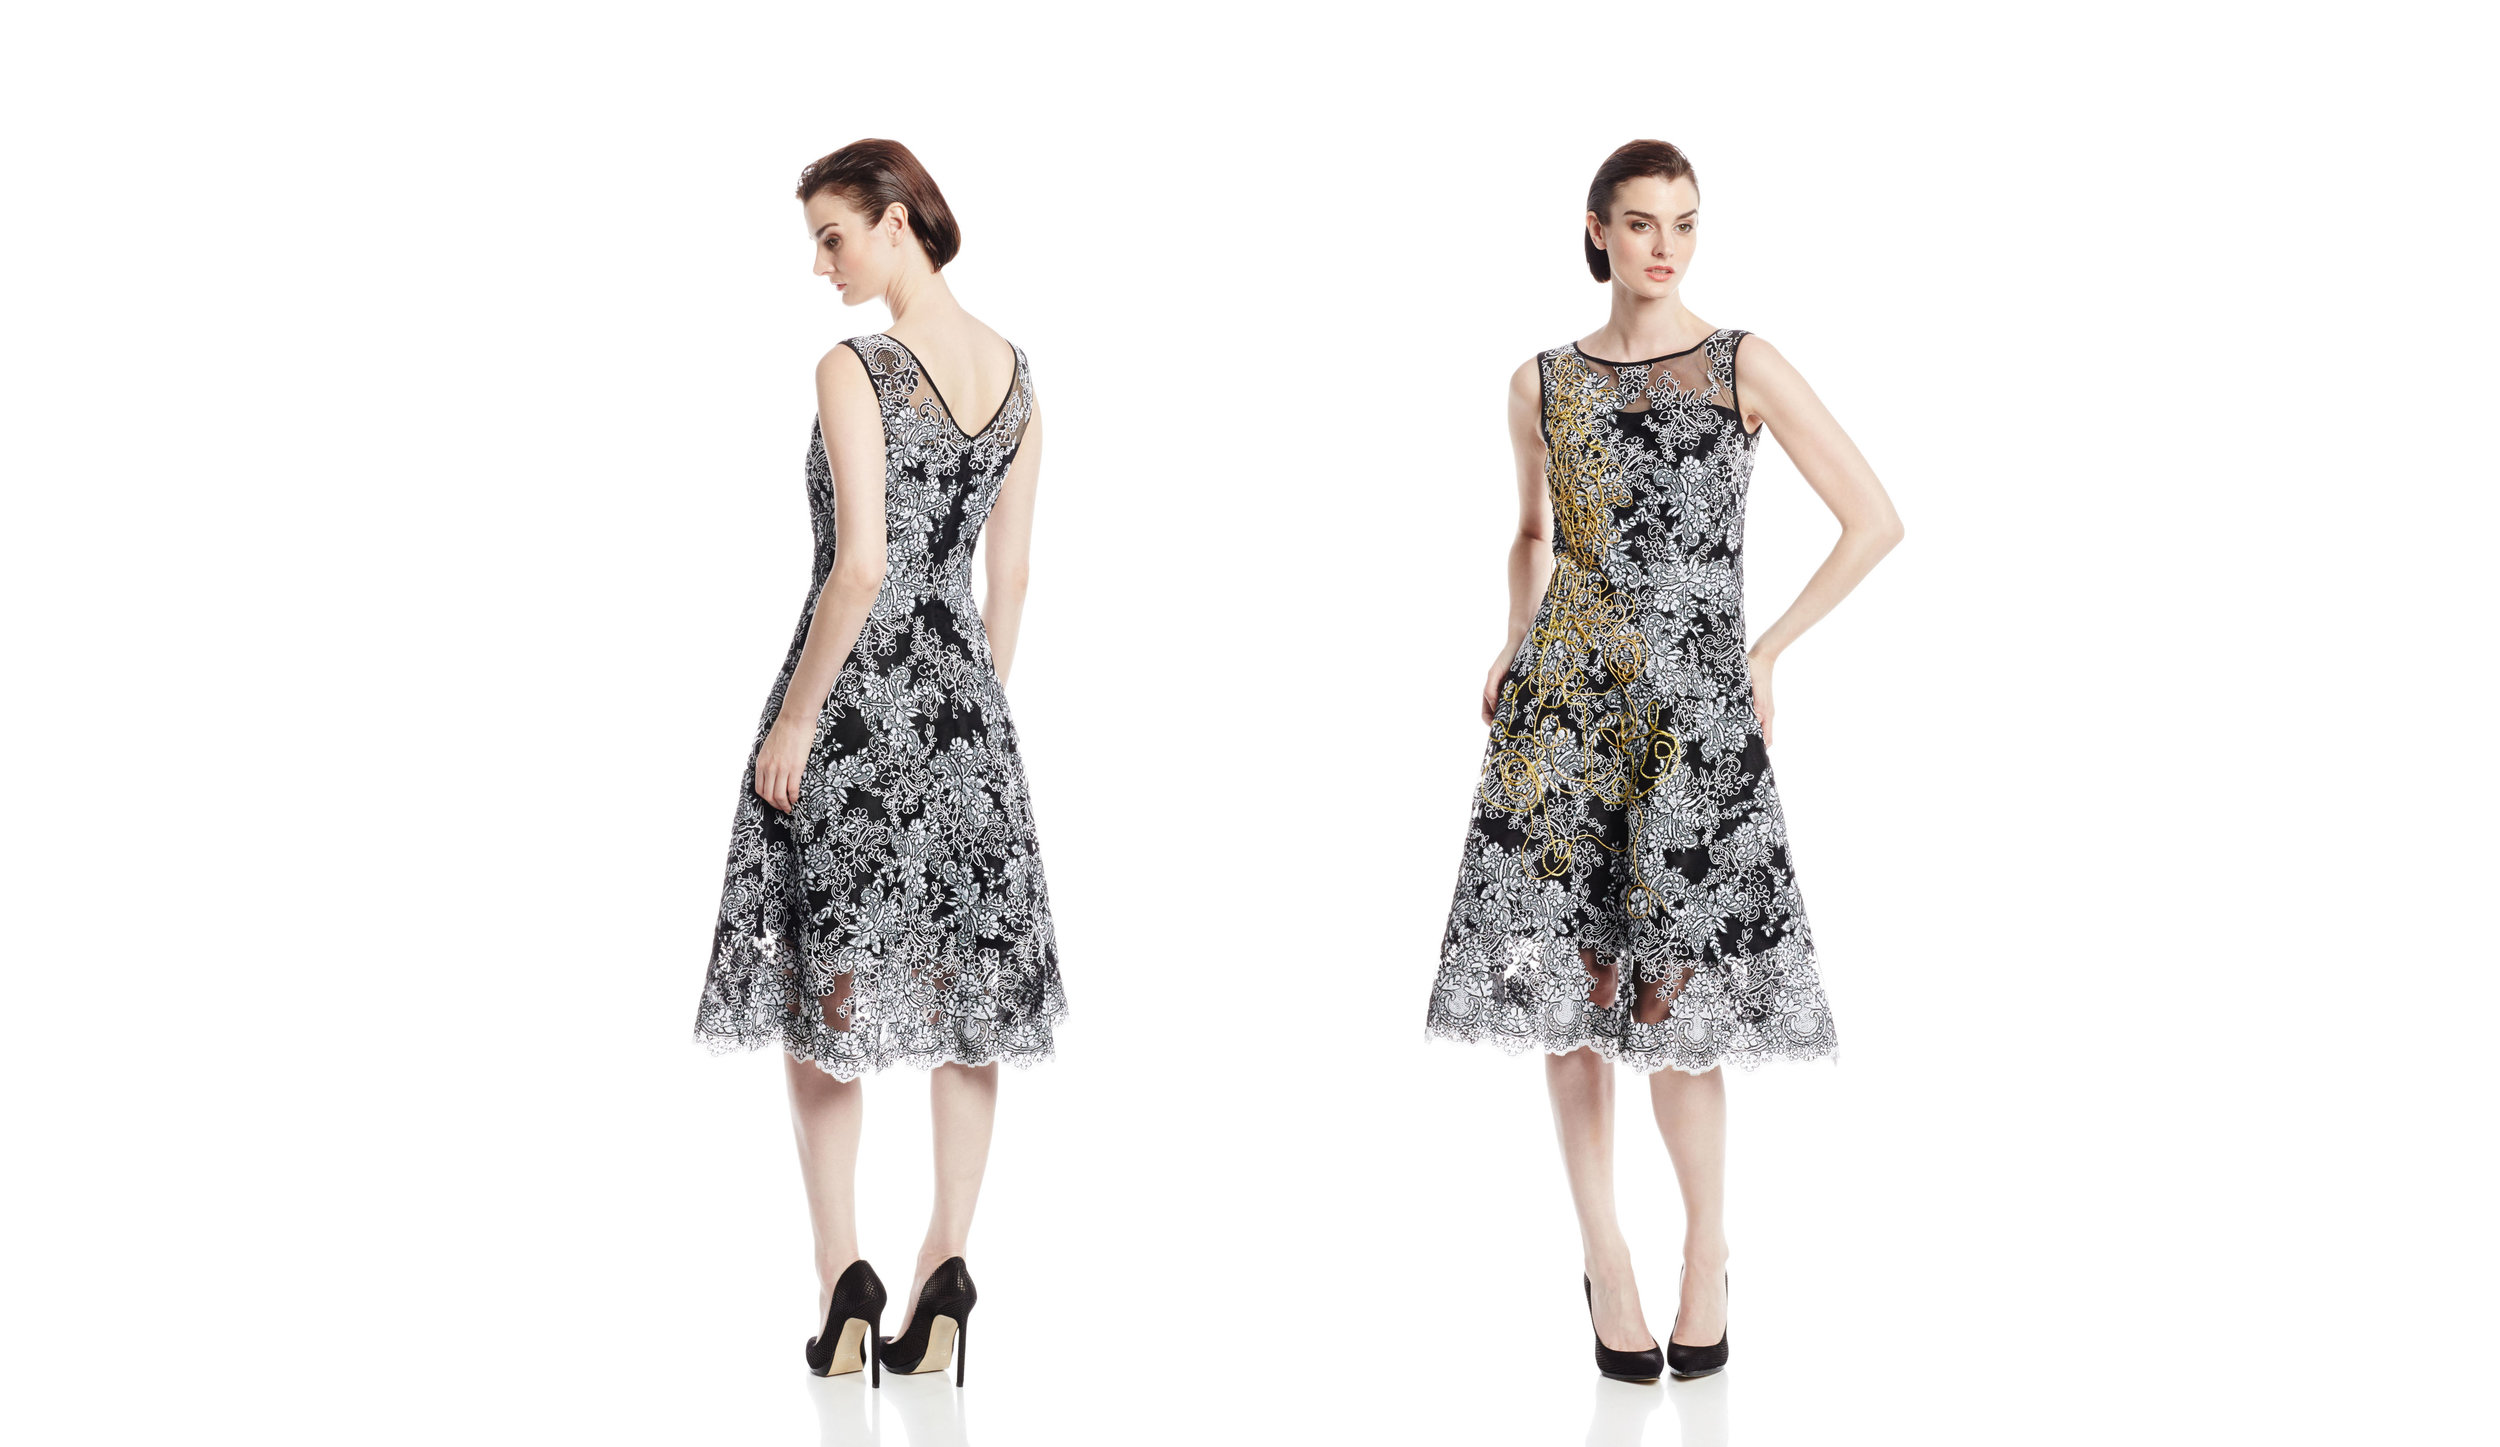 Black and White Lace Dress Full Bleed copy.jpg